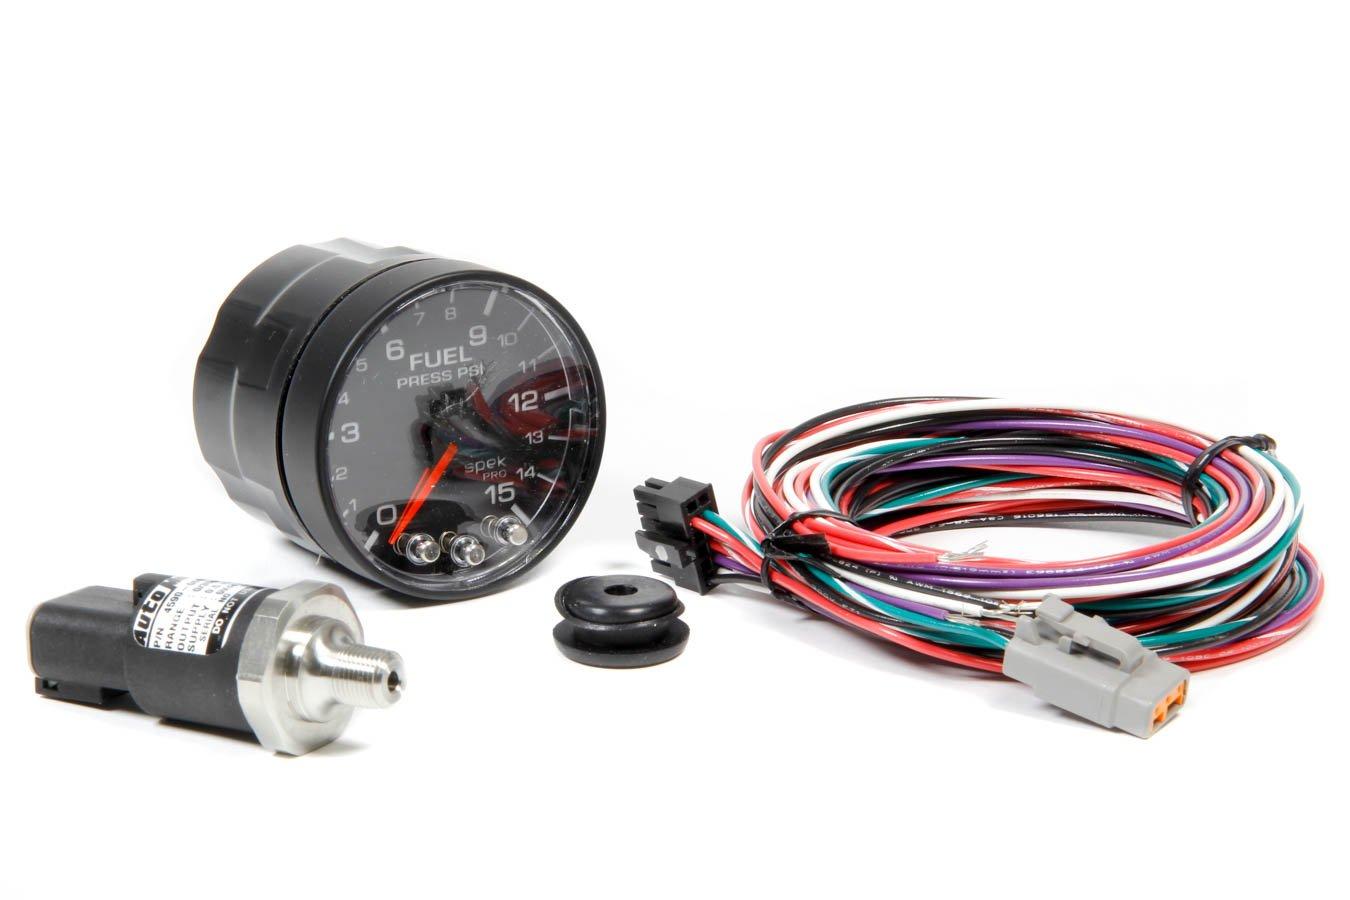 ProParts P315328 Spek-Pro 2-1/16'' Electric Fuel Pressure Gauge (0-15 PSI, 52.4mm)